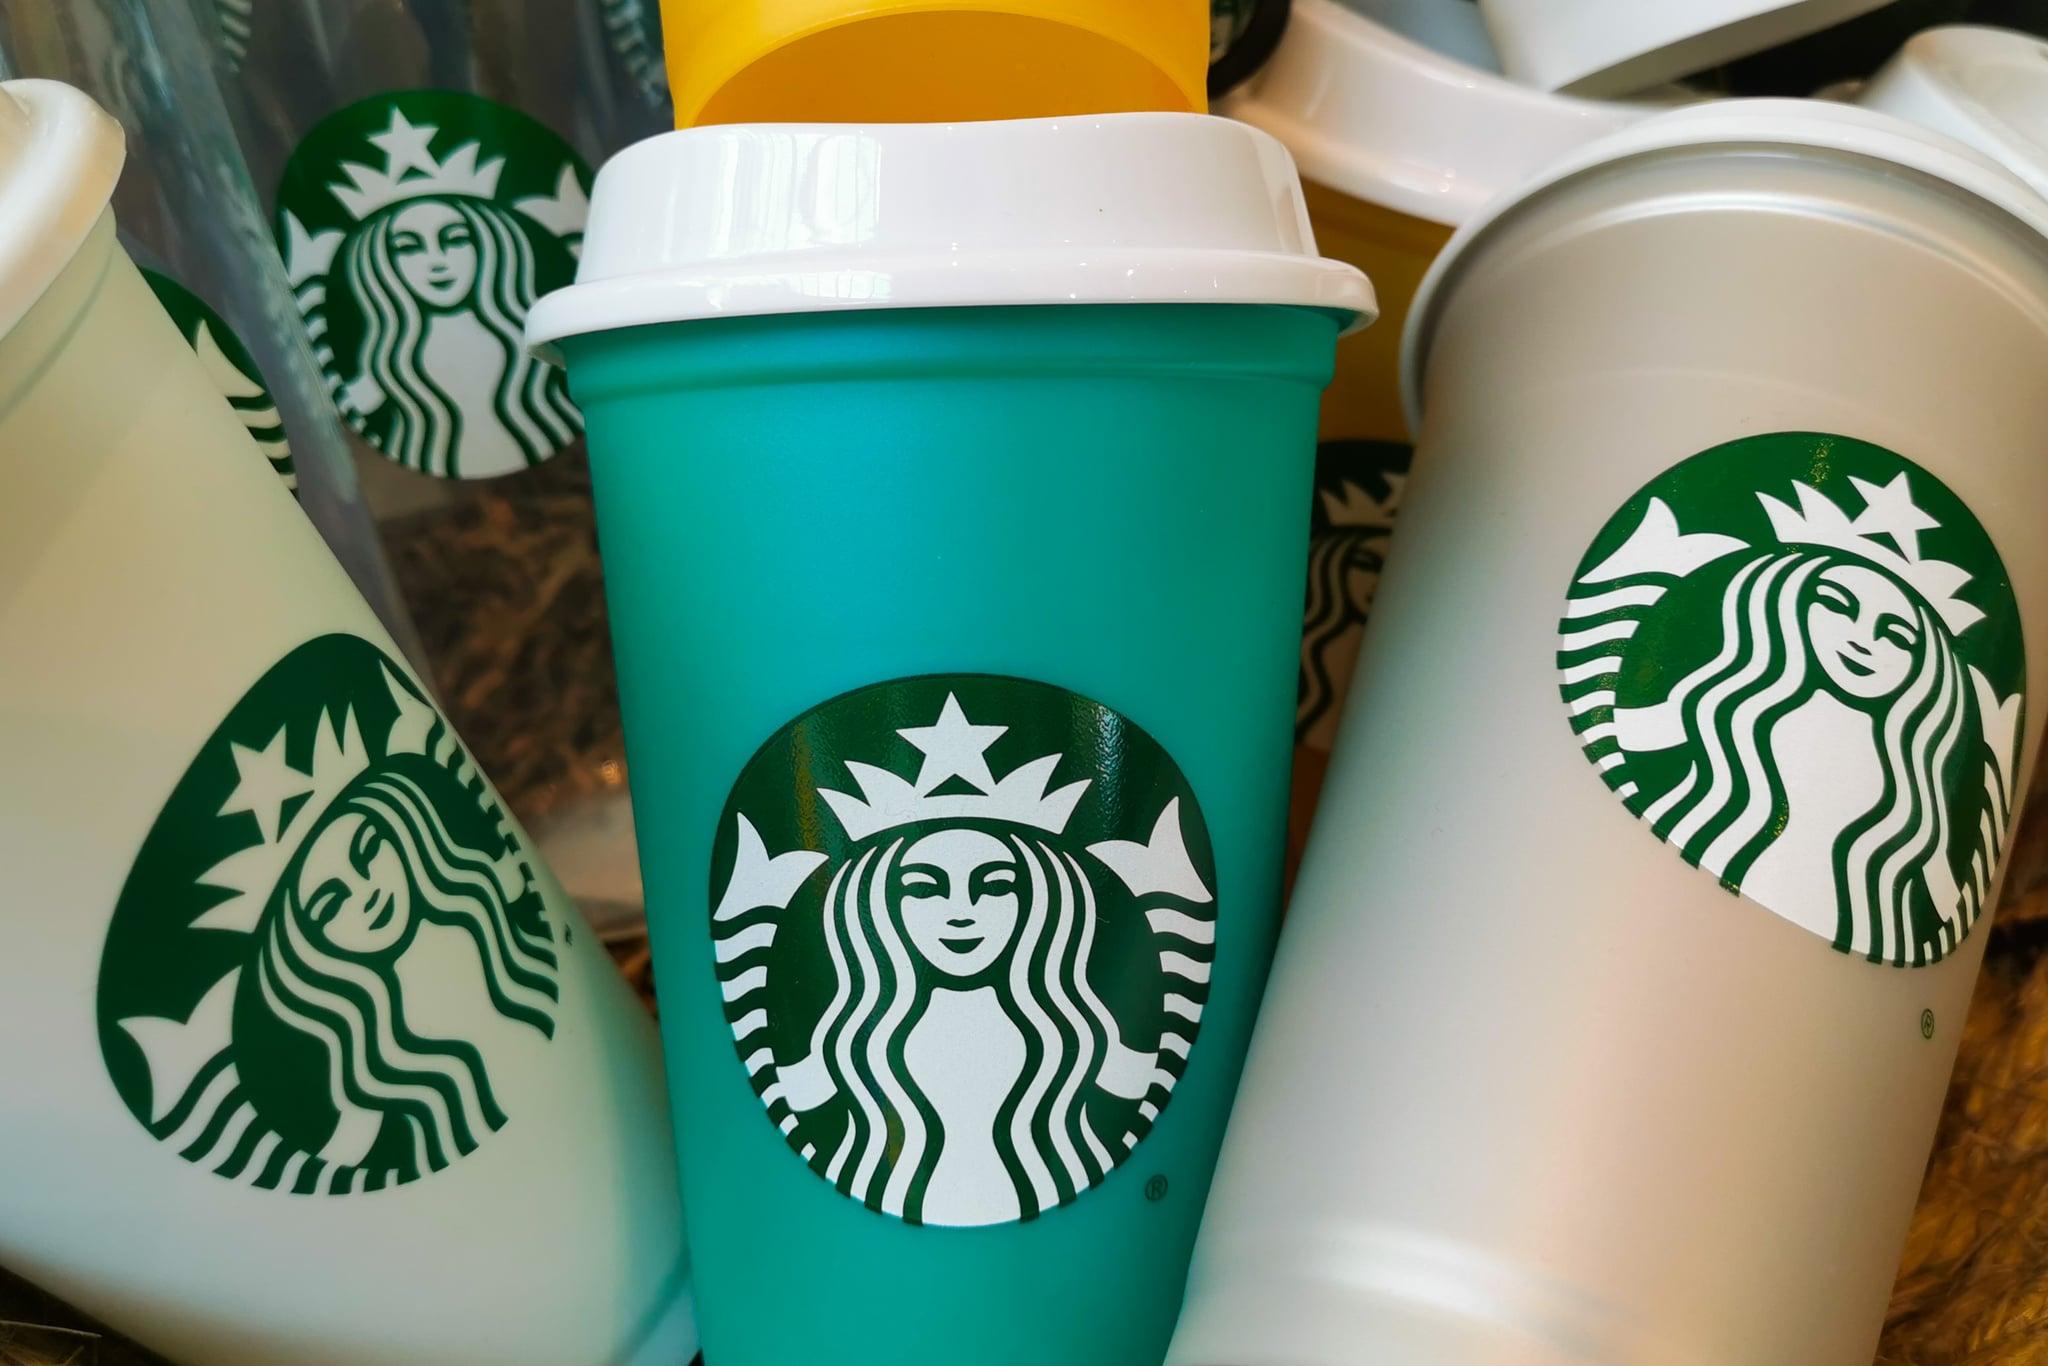 Reusabkle Starbucks cups are seen in Starbucks Coffee shop in Krakow, Poland on May 14, 2021. (Photo by Beata Zawrzel/NurPhoto via Getty Images)